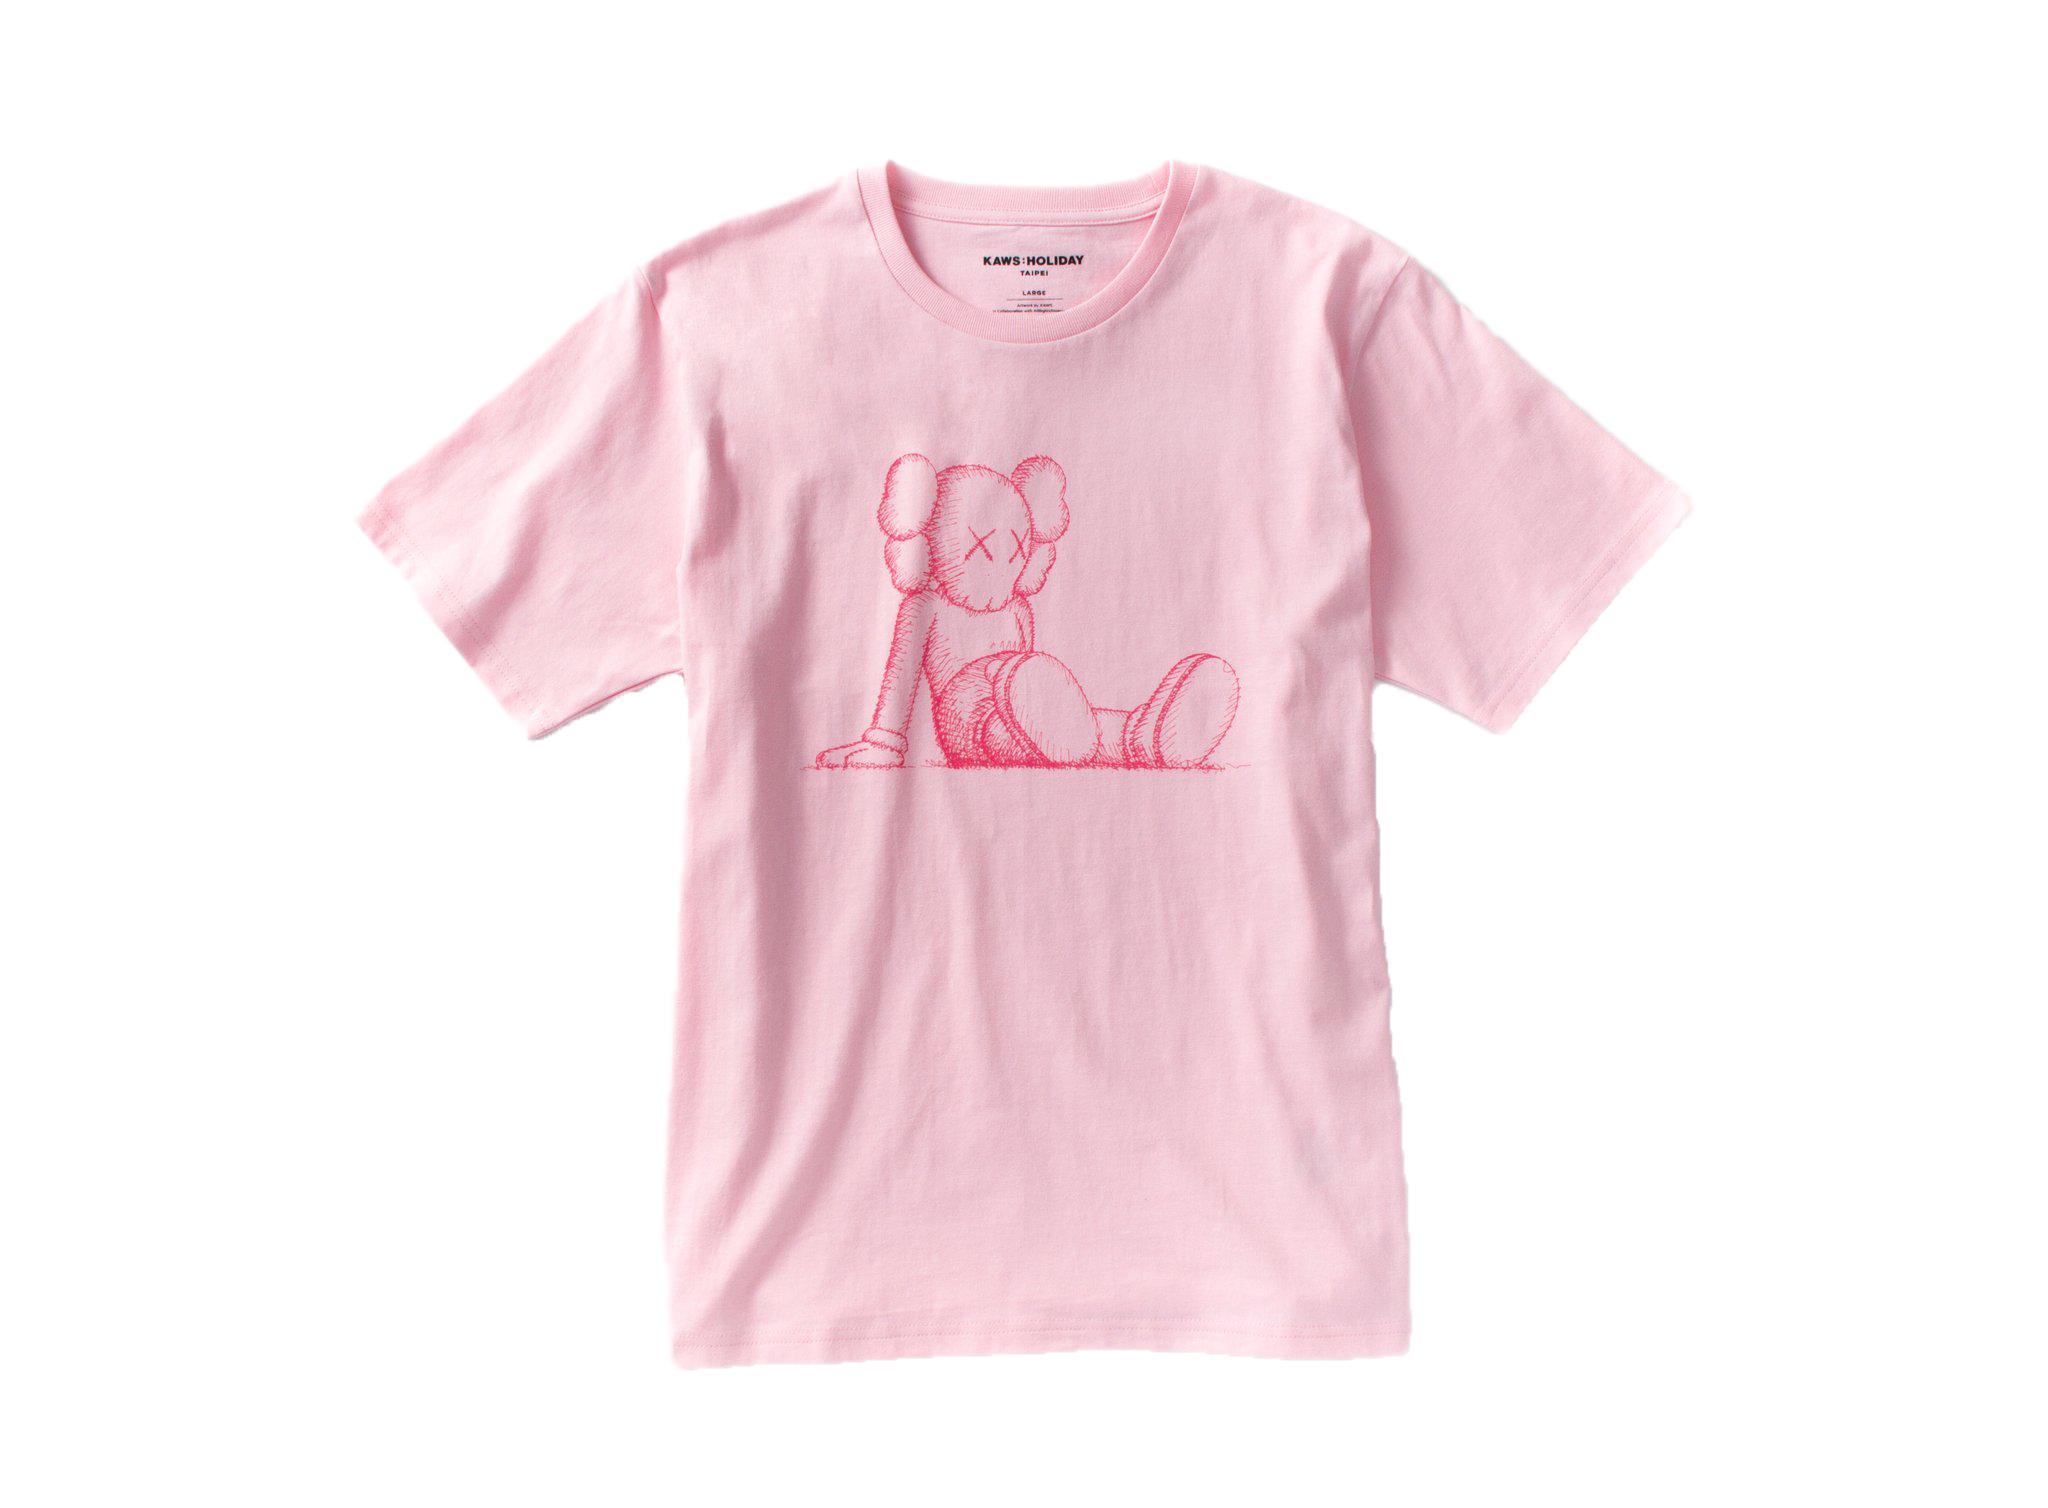 Kaws Holiday Limited Companion T-Shirt Pink